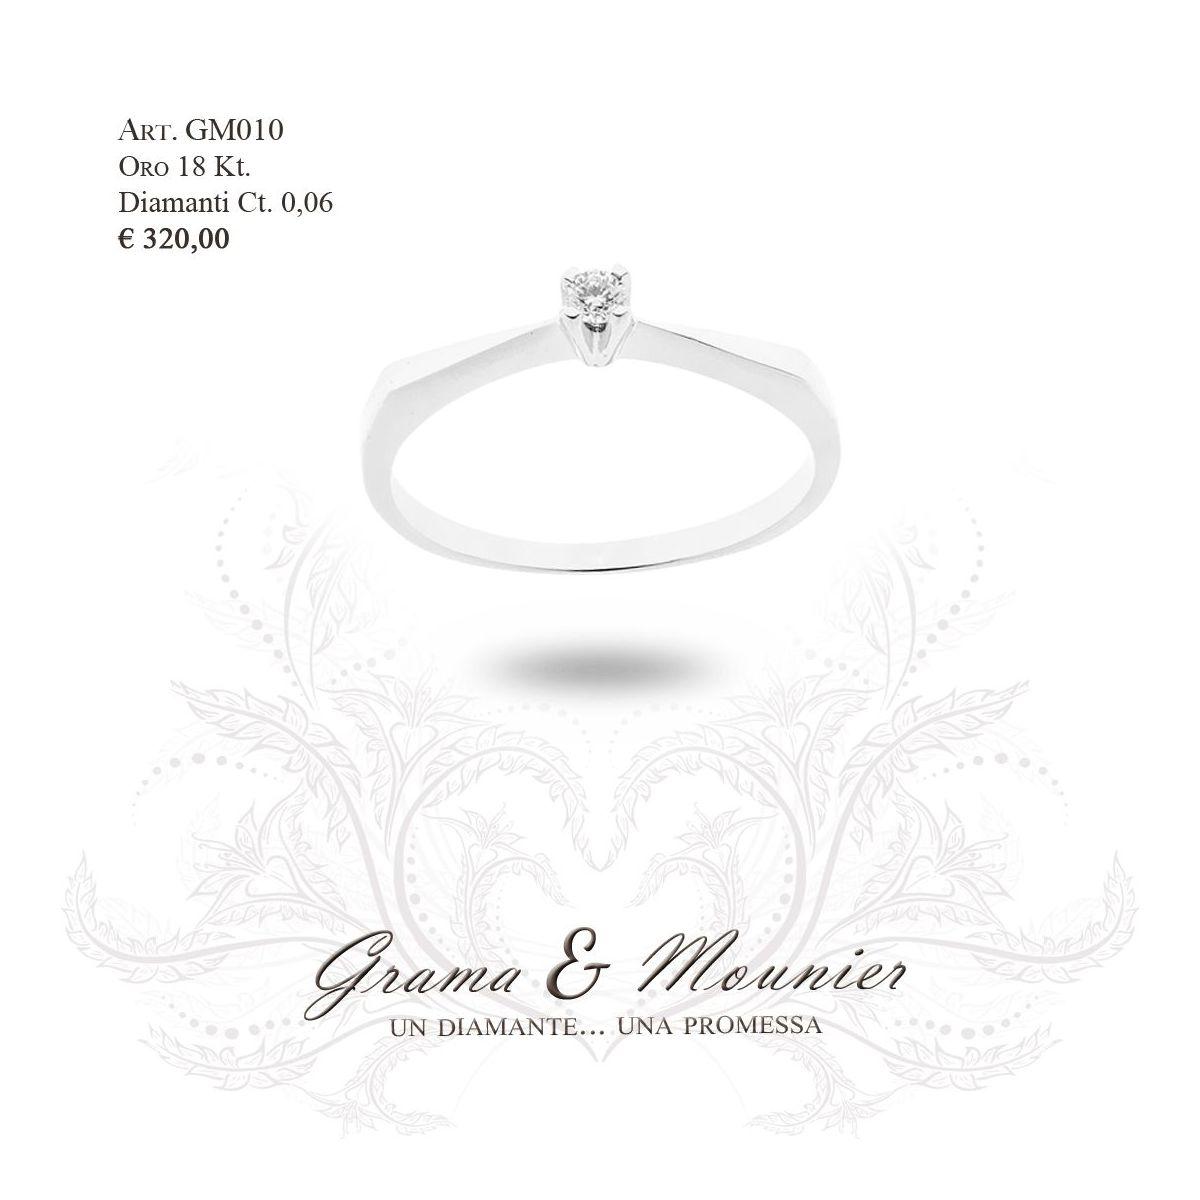 Anello in oro 18Kt. Grama&Mounier Art.GM010